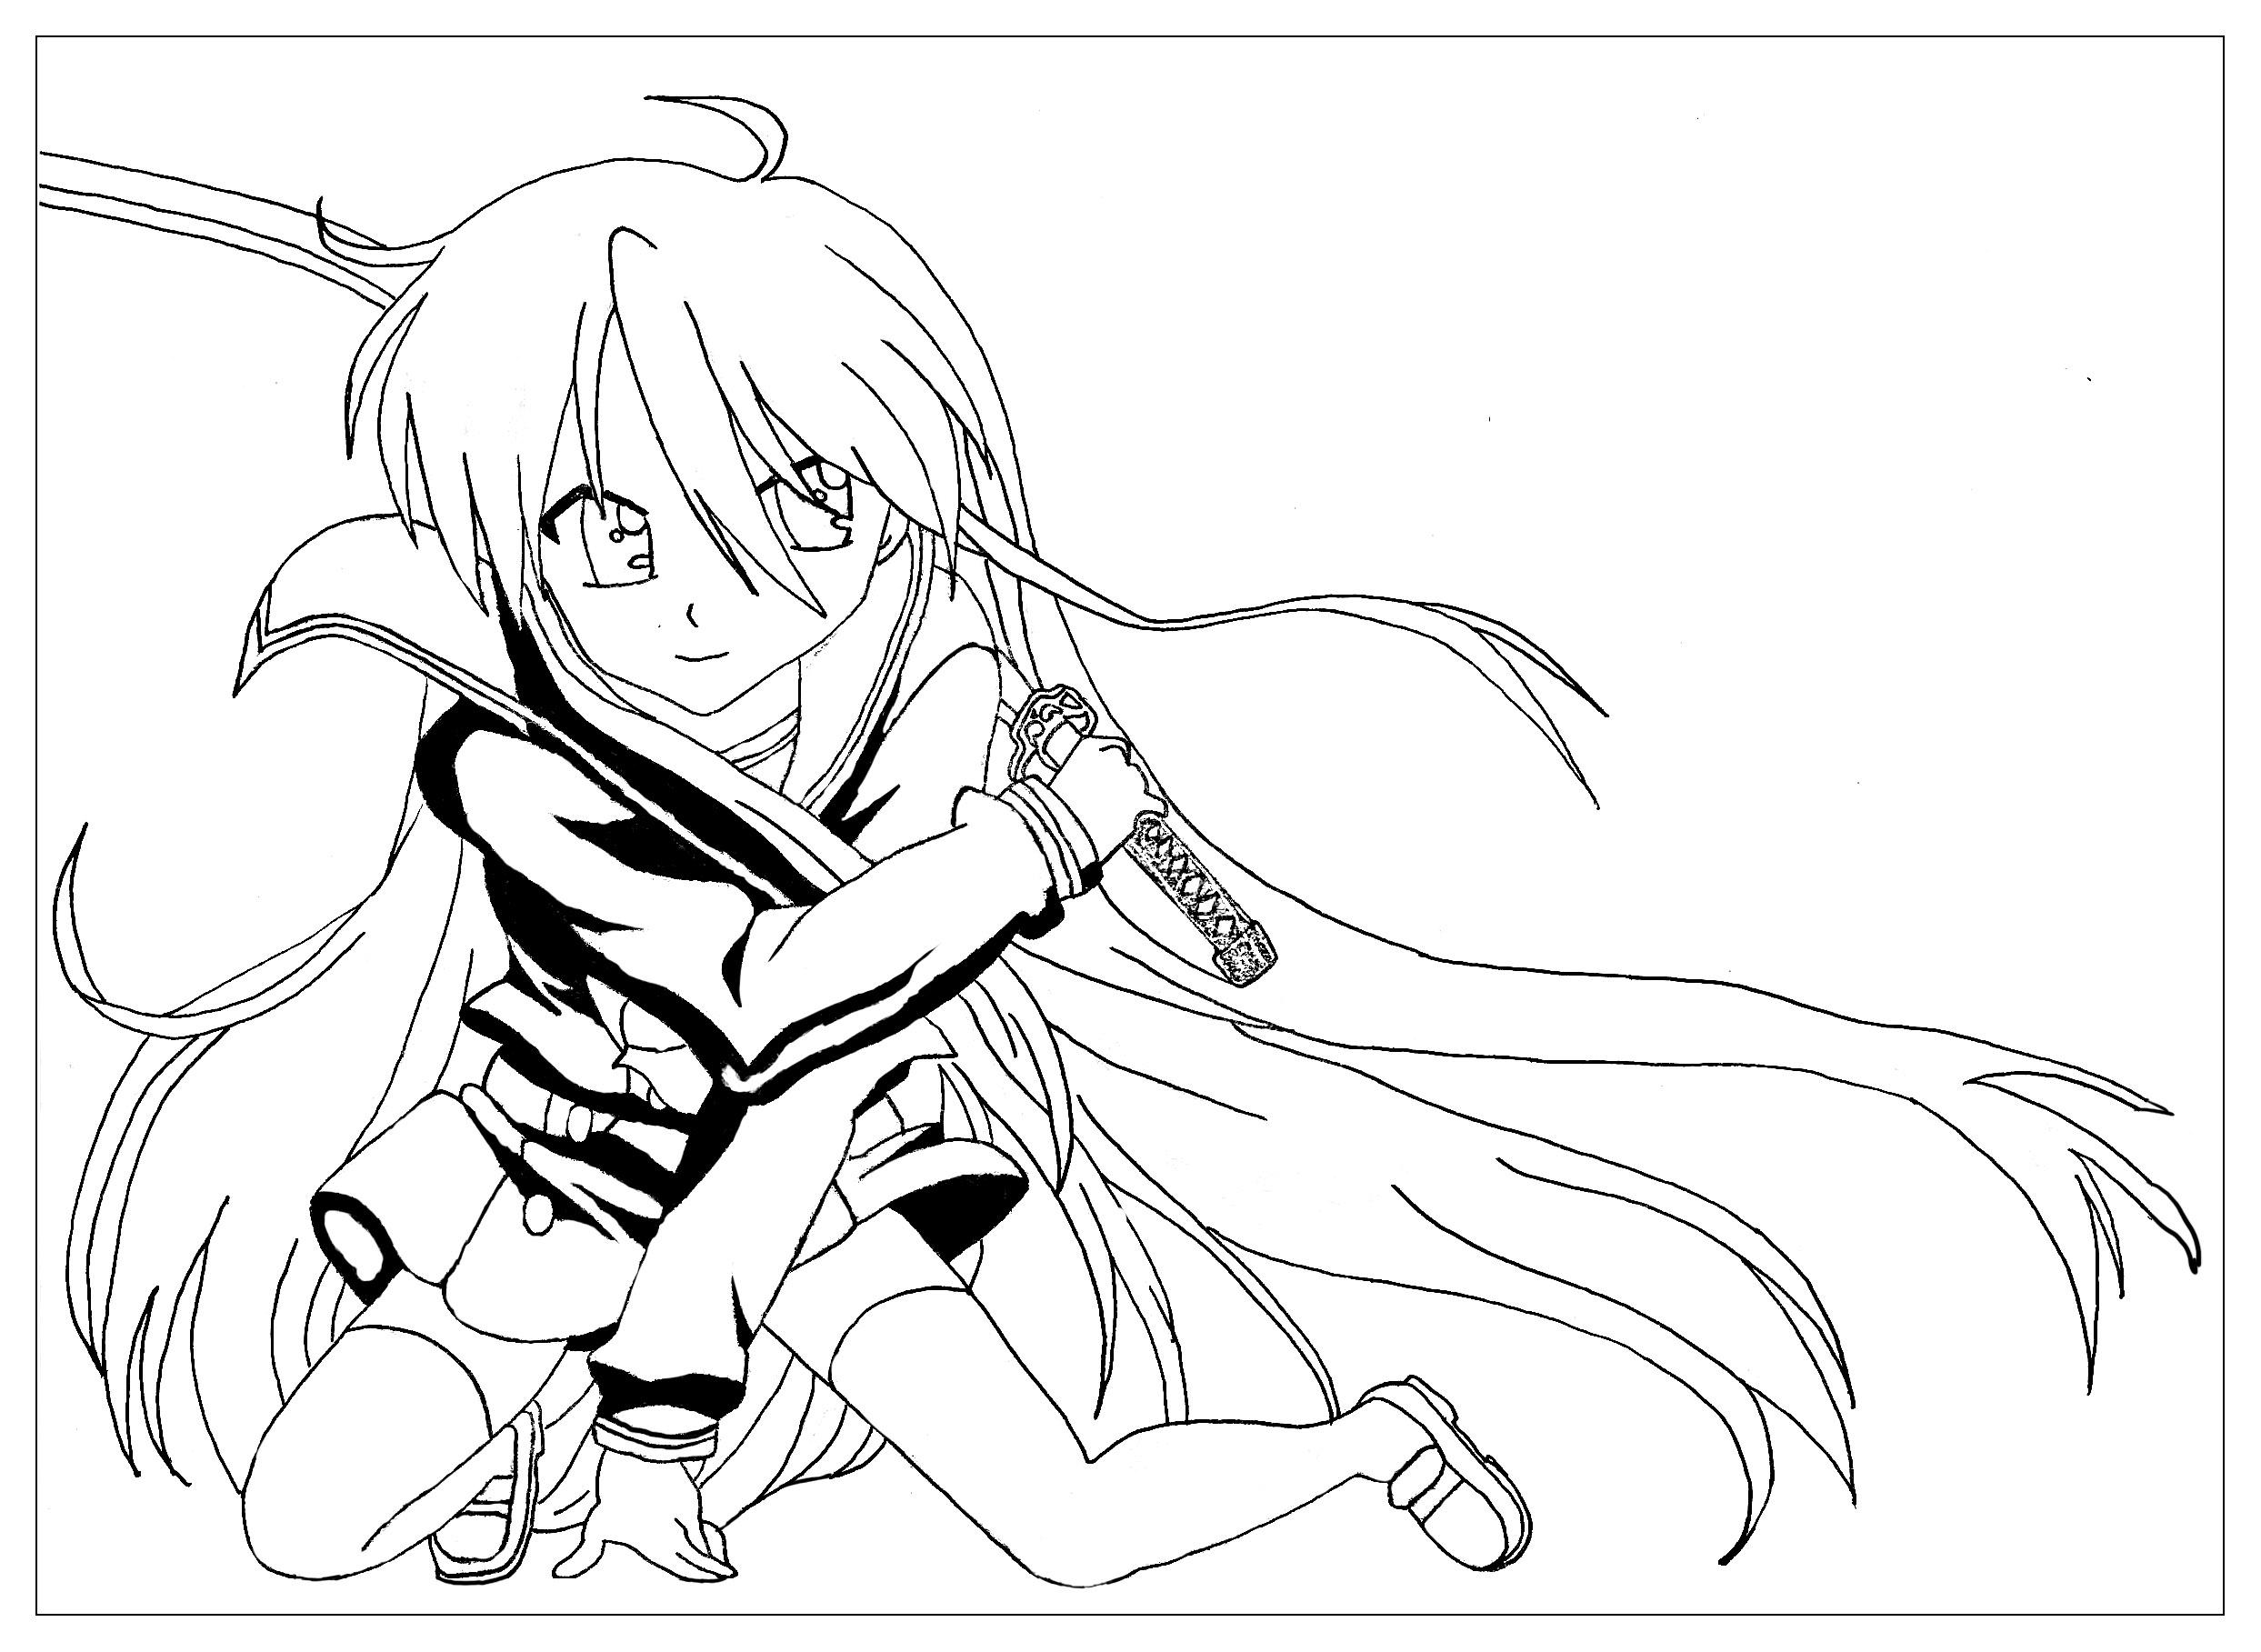 Manga saber warrior girl - Manga / Anime Adult Coloring Pages